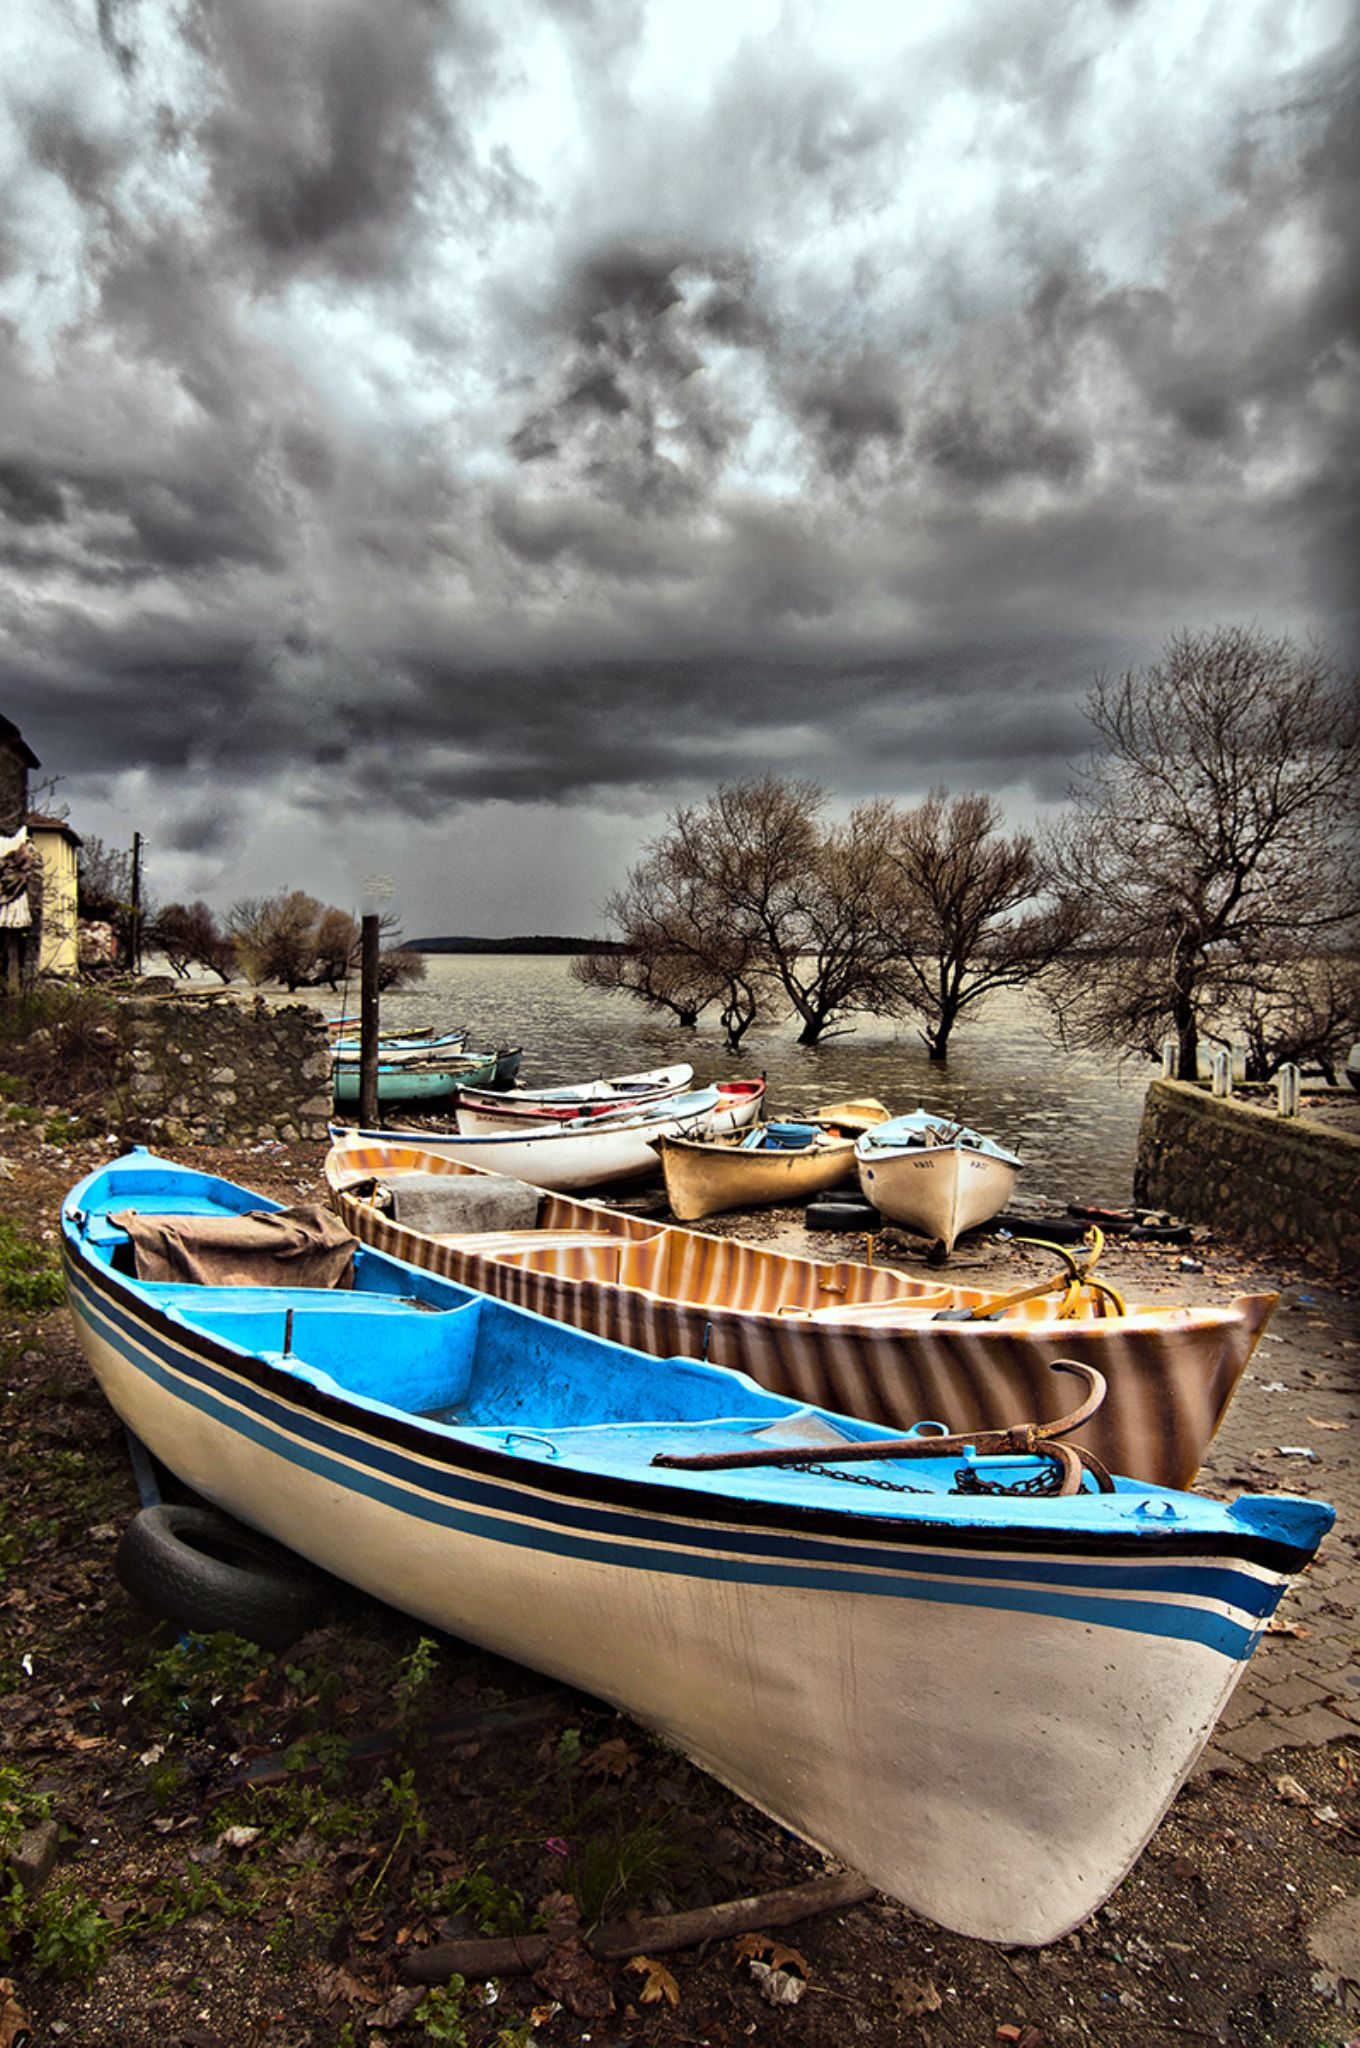 Gölyazı by mustafaozdemirphotography